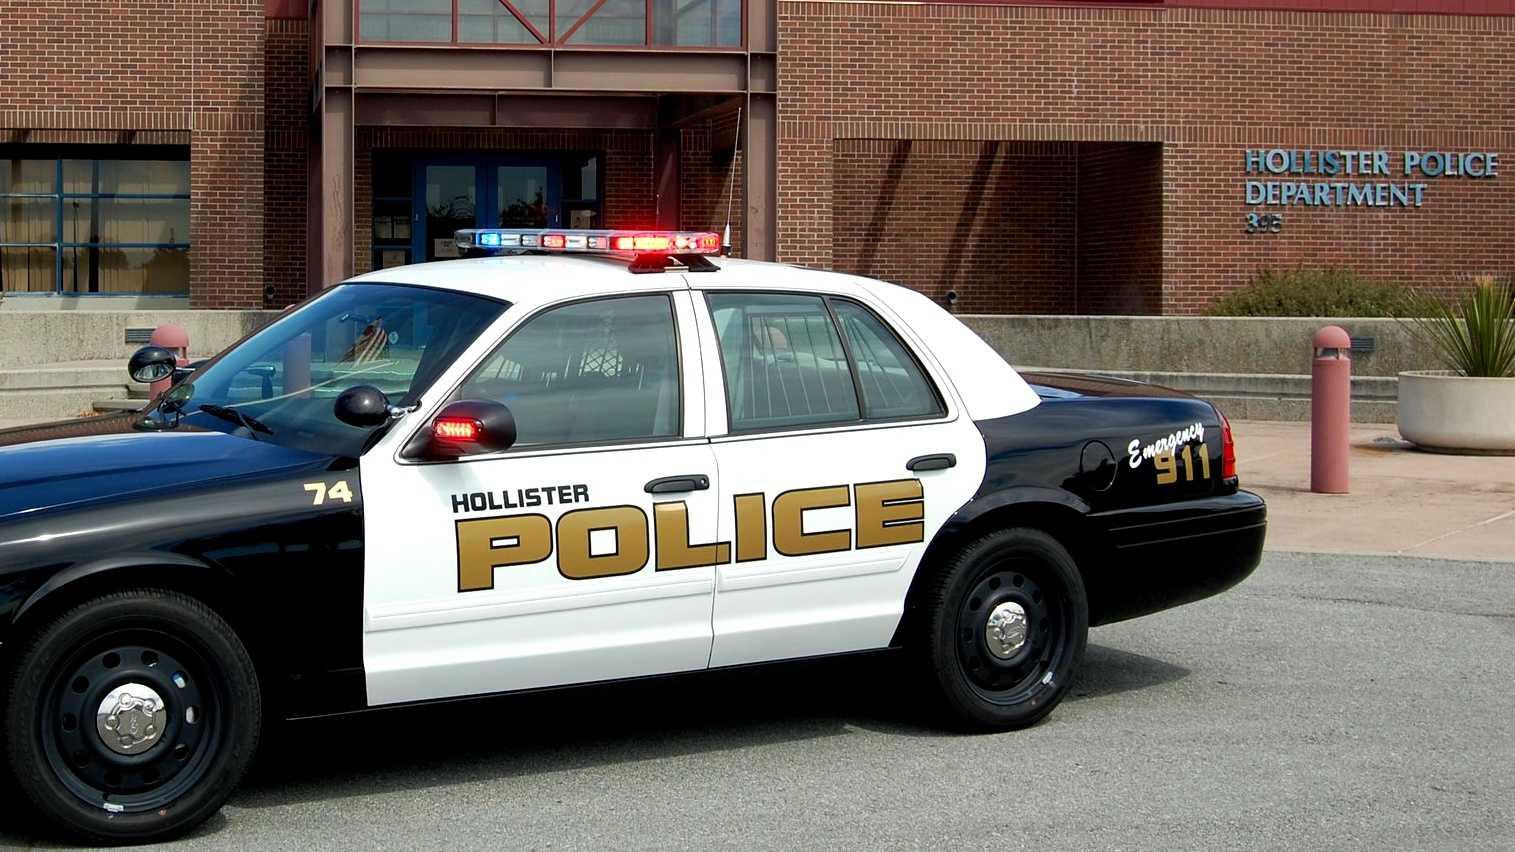 Hollister police